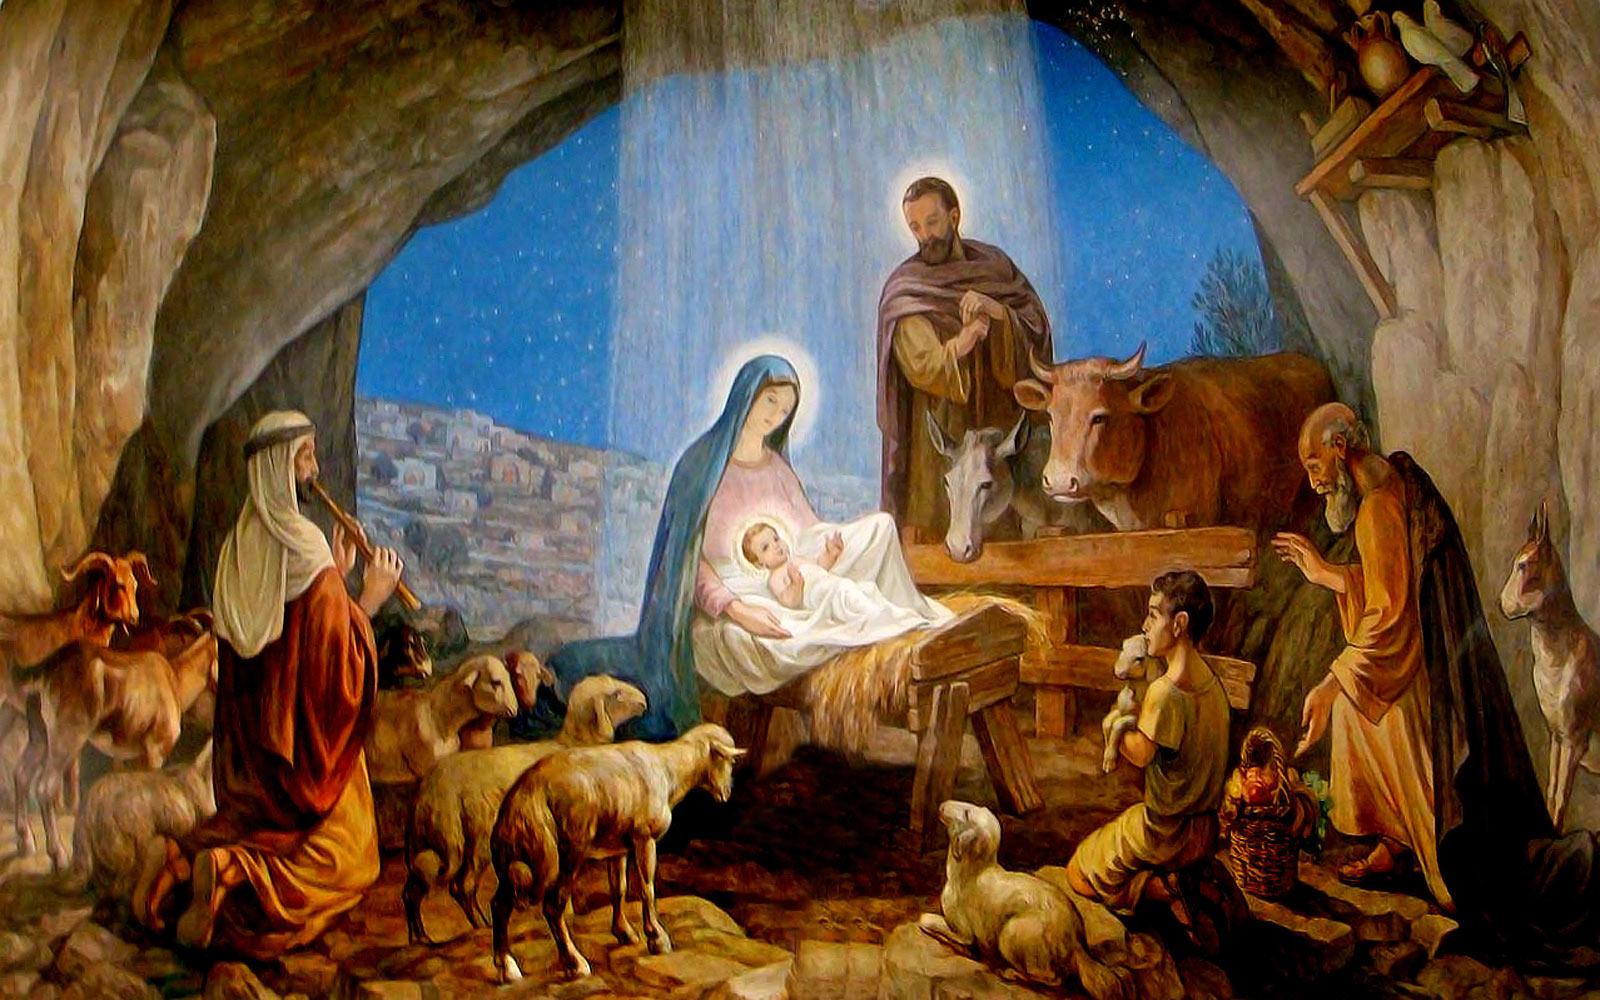 Merry Christmas Jesus Images Hd.Merry Christmas Bada Din Jesus 25 Dec 2016 Wallpaper Images